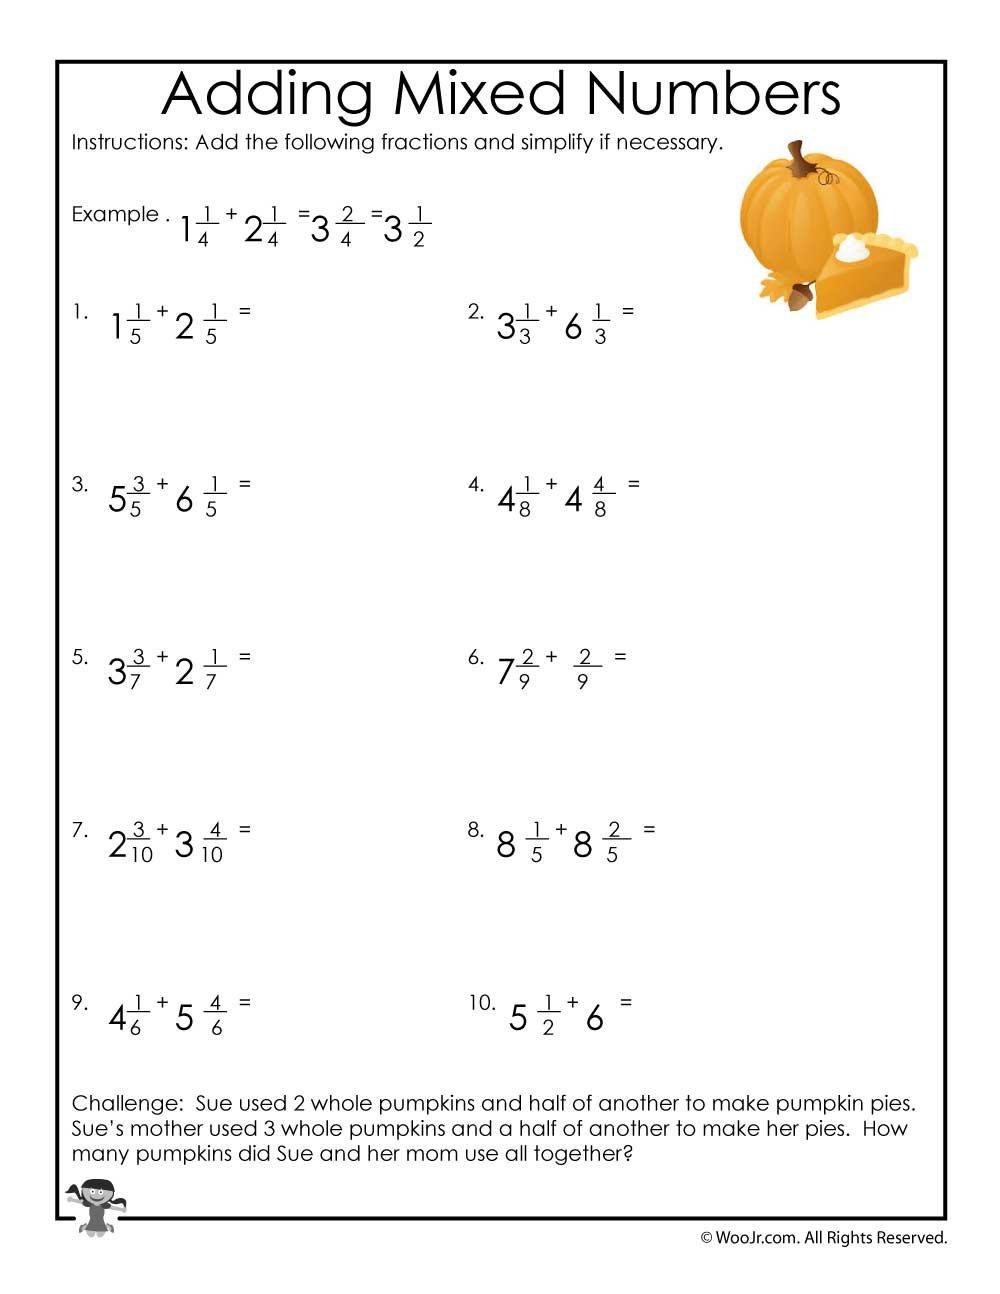 Adding Mixed Numbers Worksheet  Woo Jr Kids Activities In Adding Mixed Numbers Worksheet